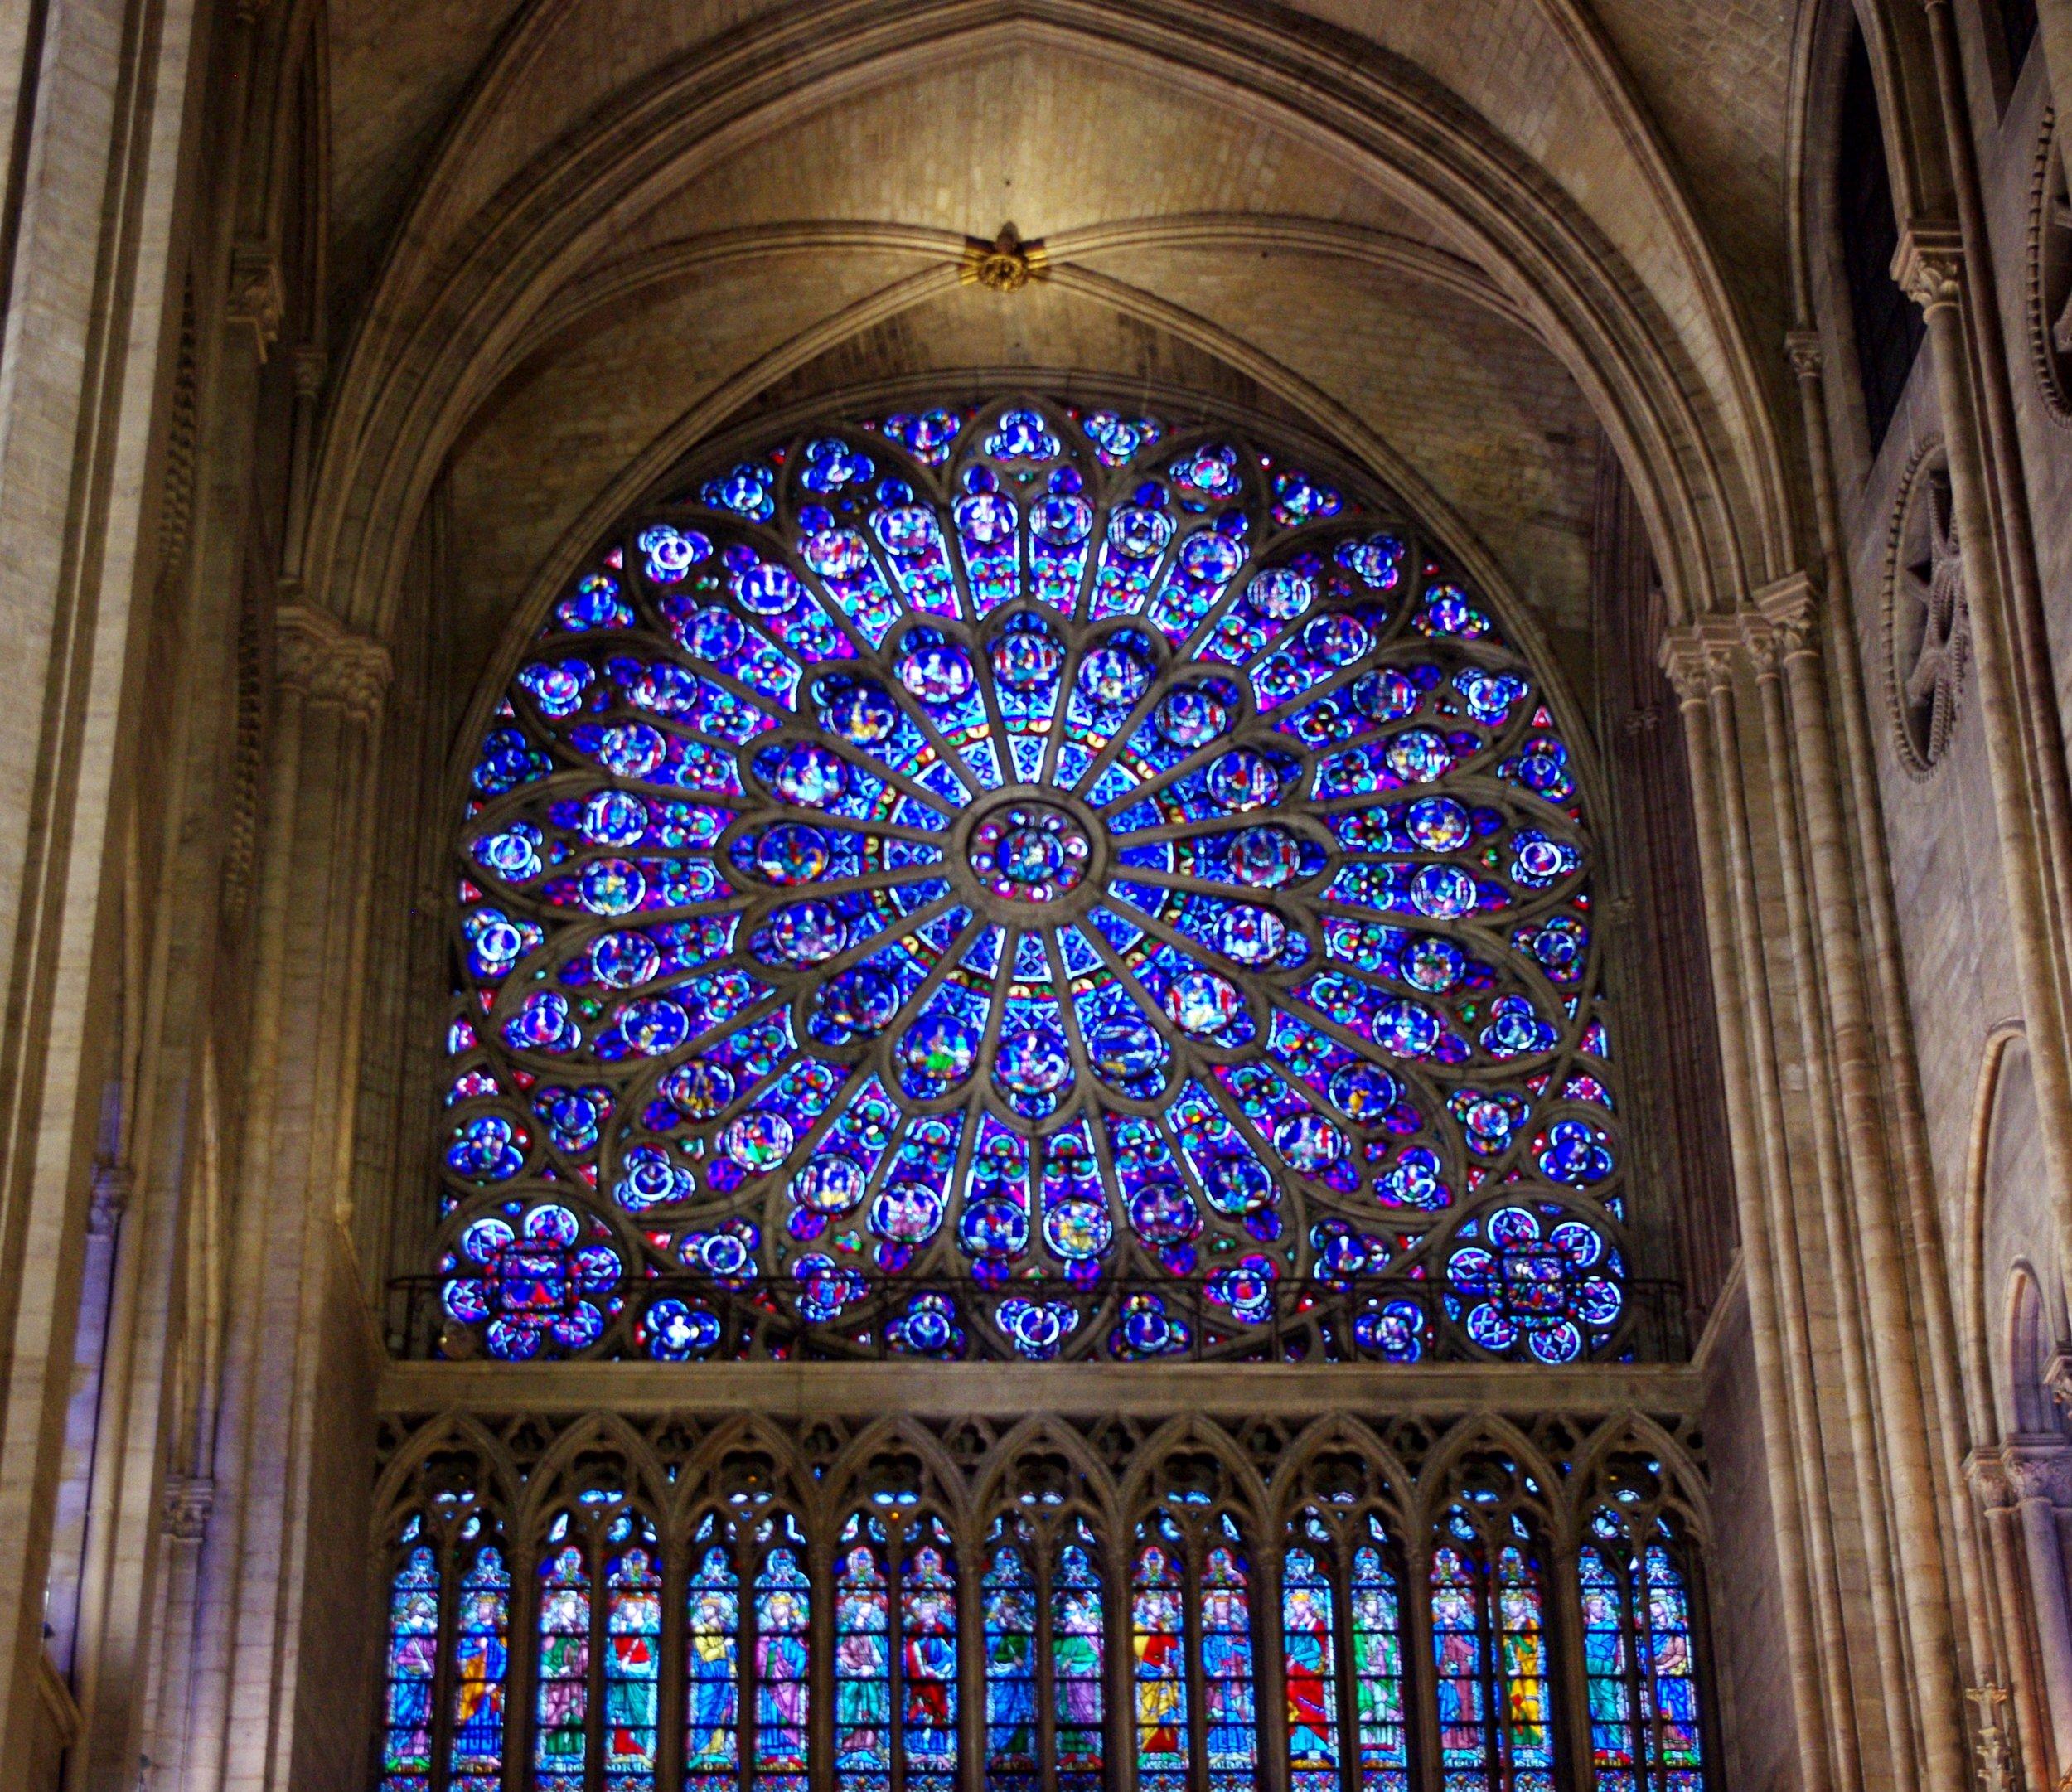 North_Rose_Window_in_Notre_Dame,_2013.jpg